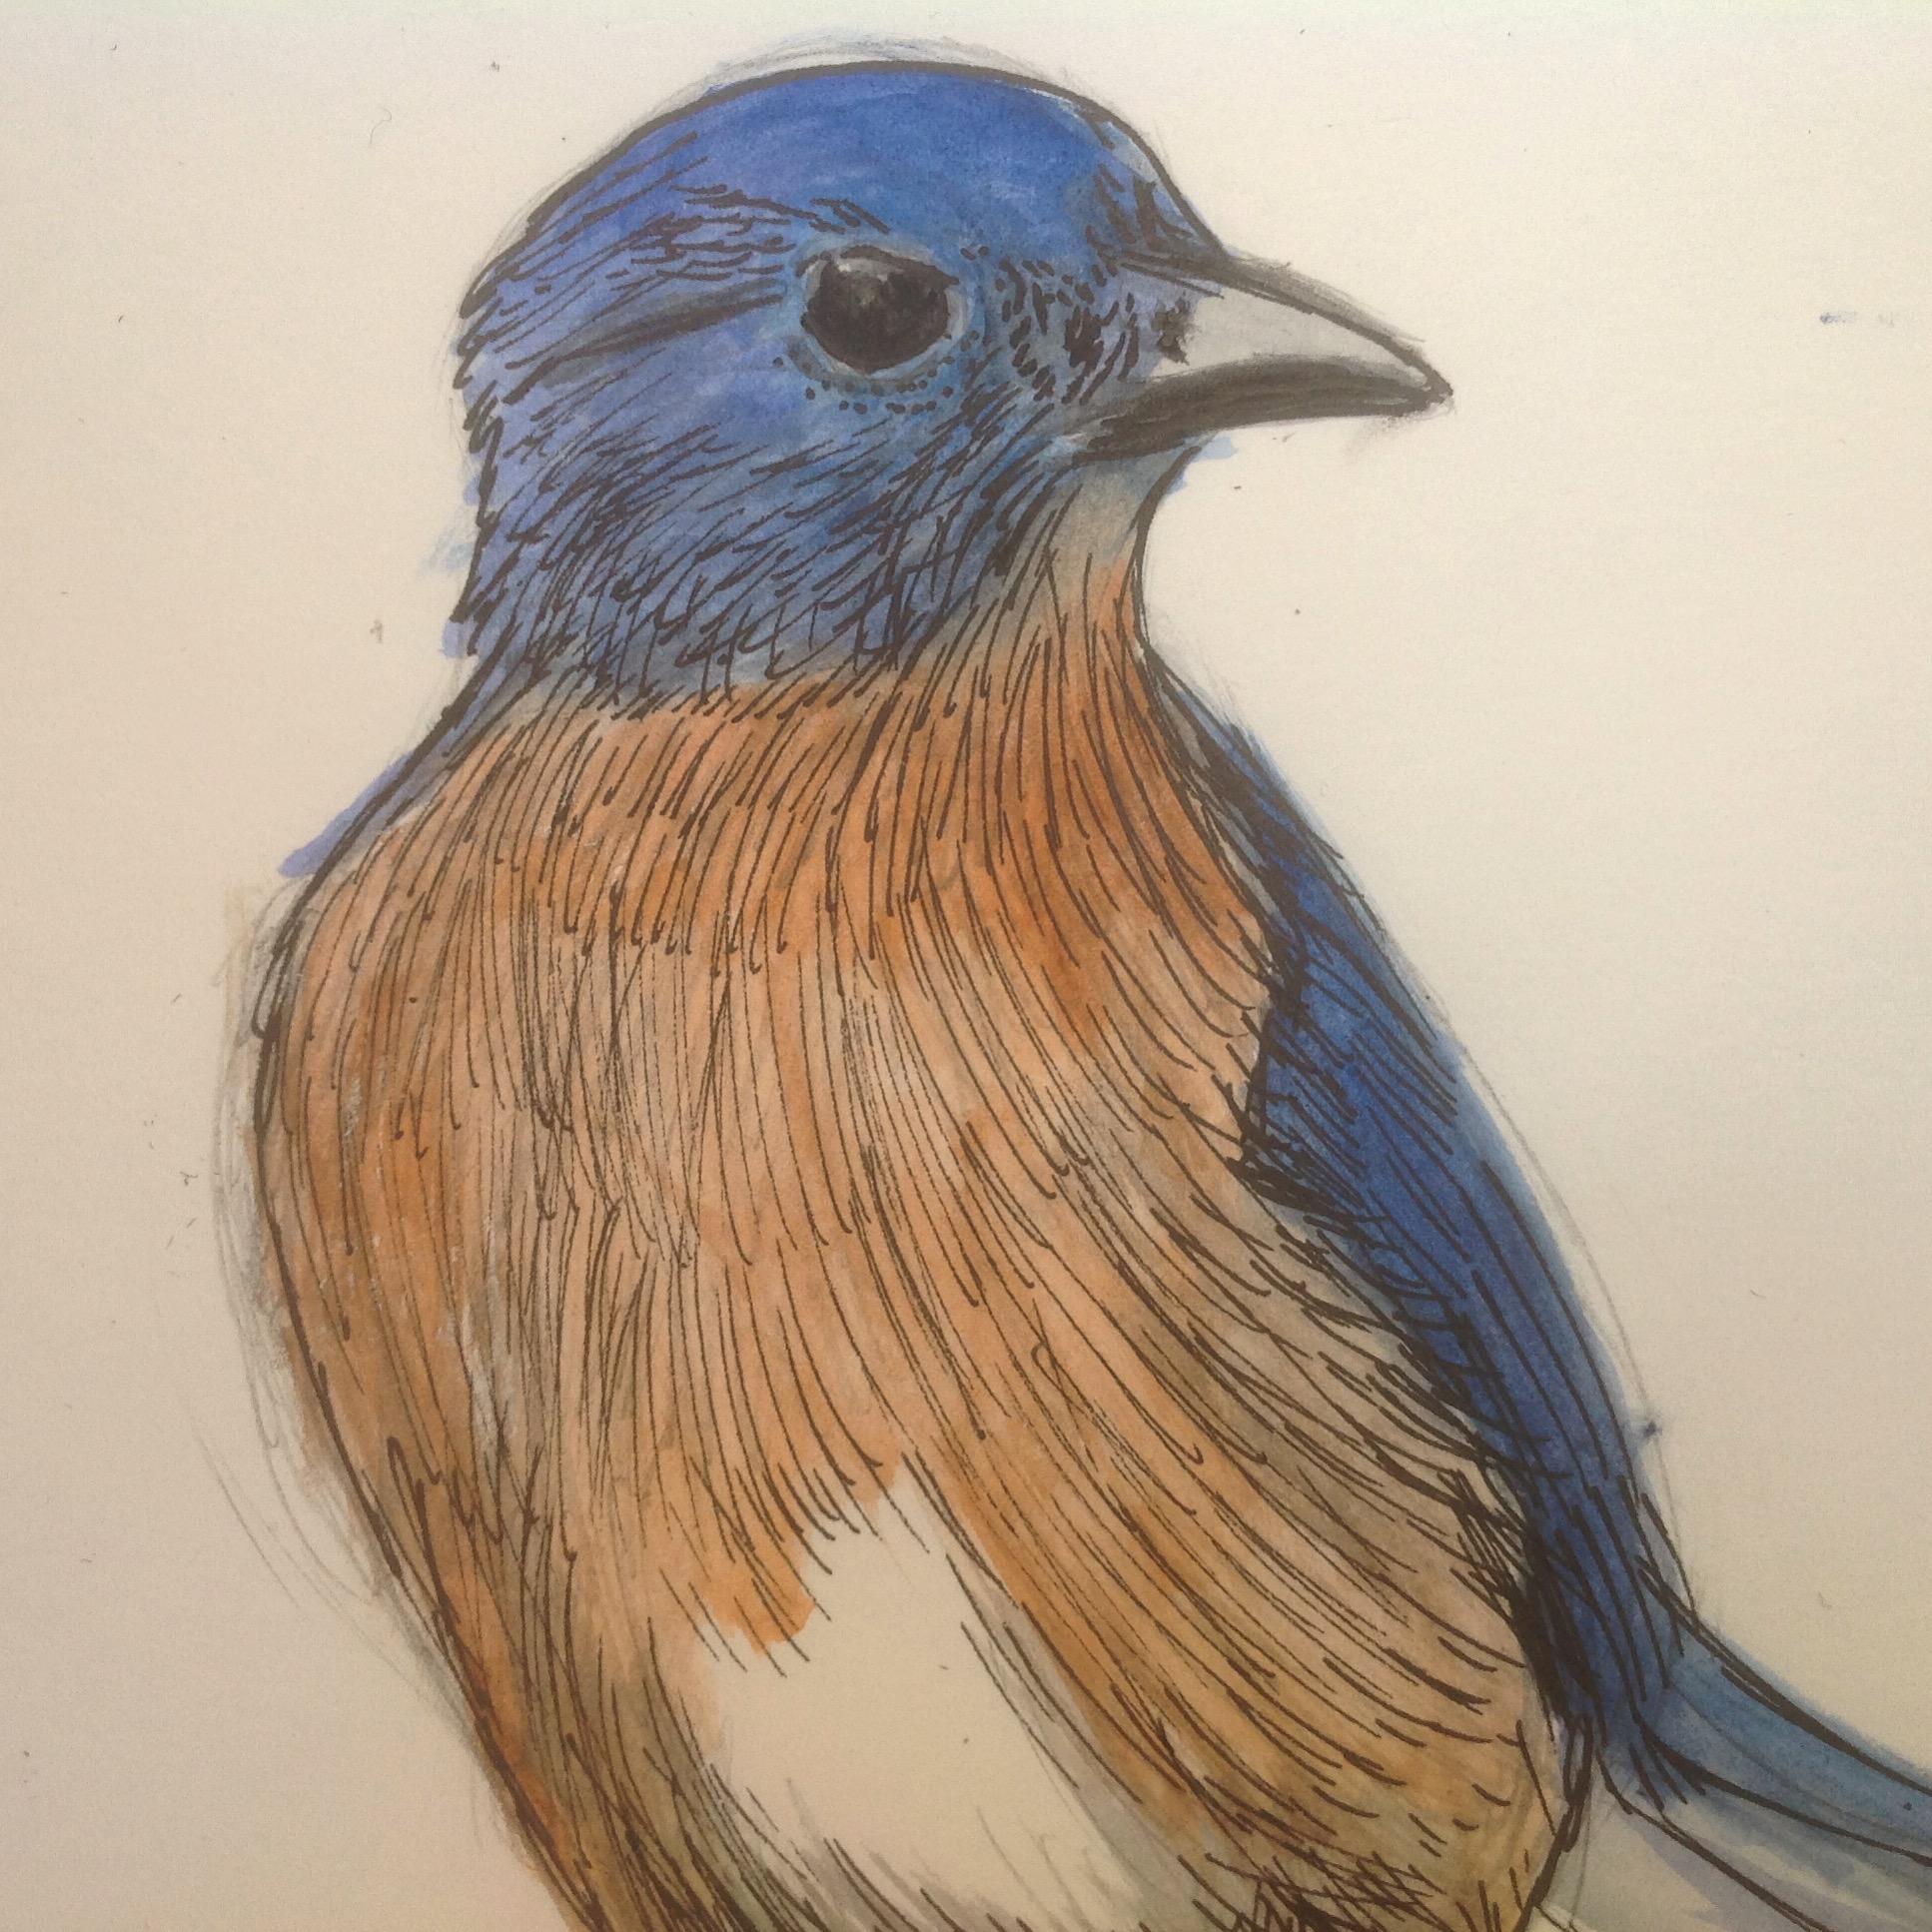 58-365 bluebird.JPG